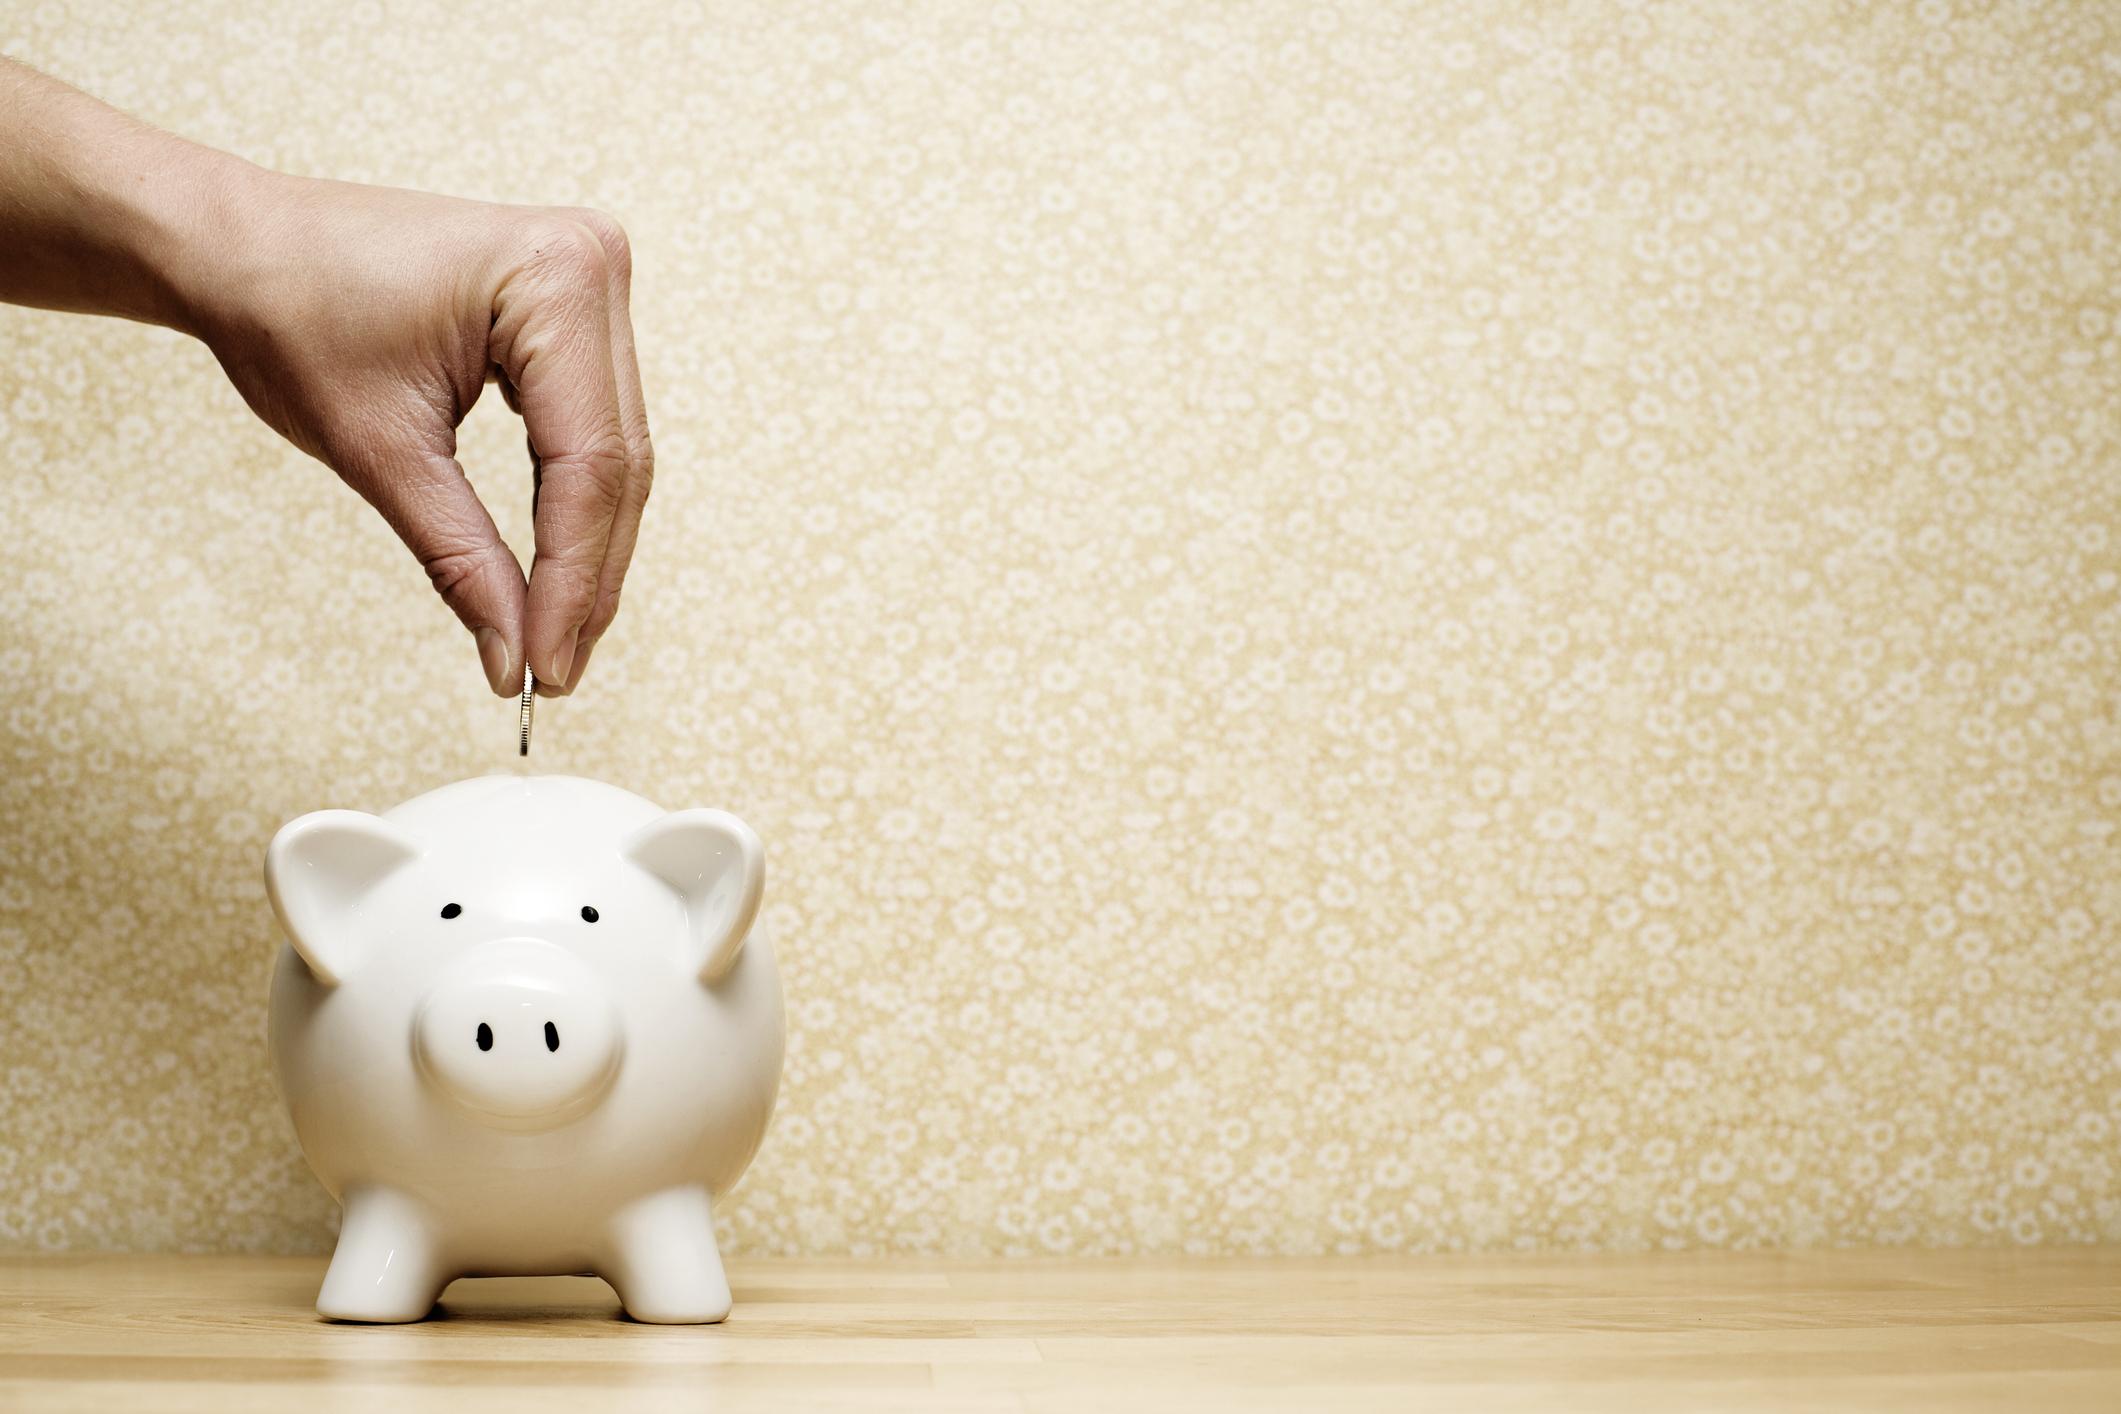 Person putting a coin into a white piggy bank